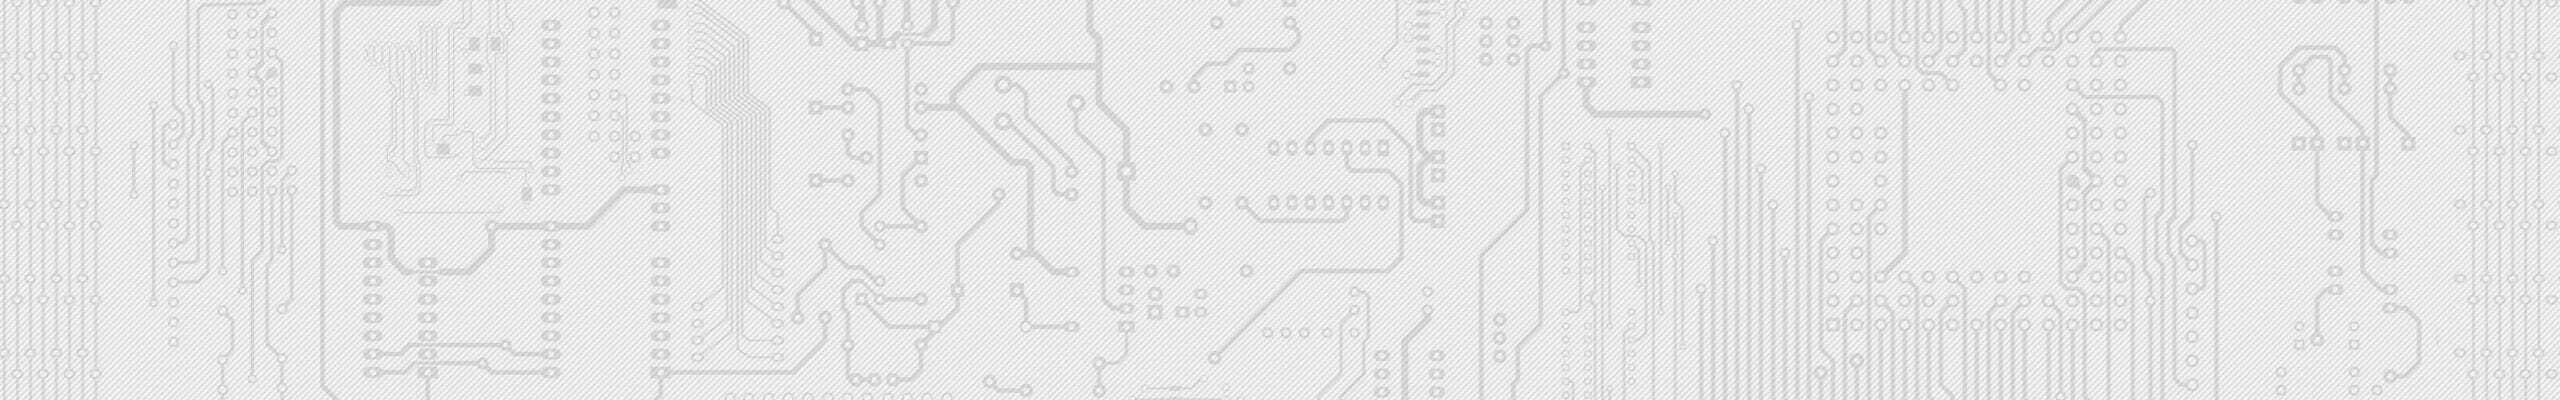 Bill & Dave Computer Repair 613-317-1200 www.billanddave.ca